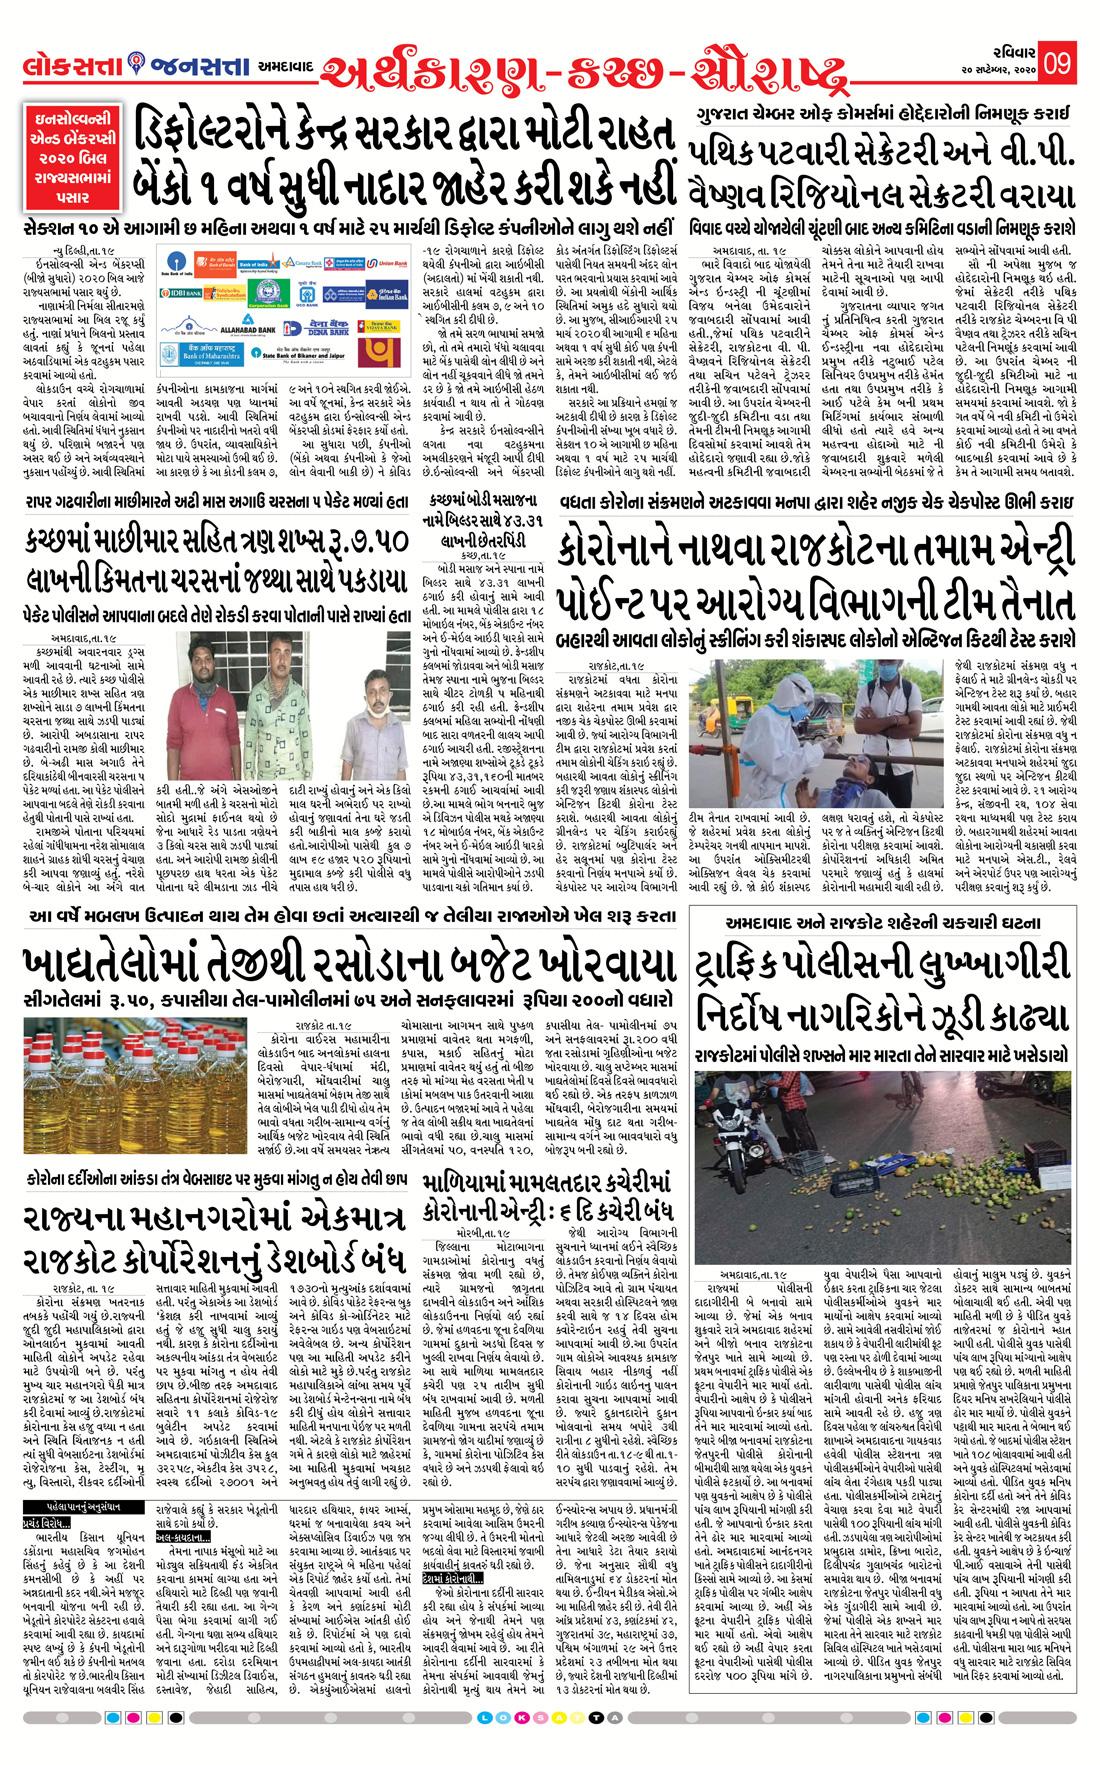 Loksatta Jansatta News Papaer E-paper dated 2020-09-20   Page 9